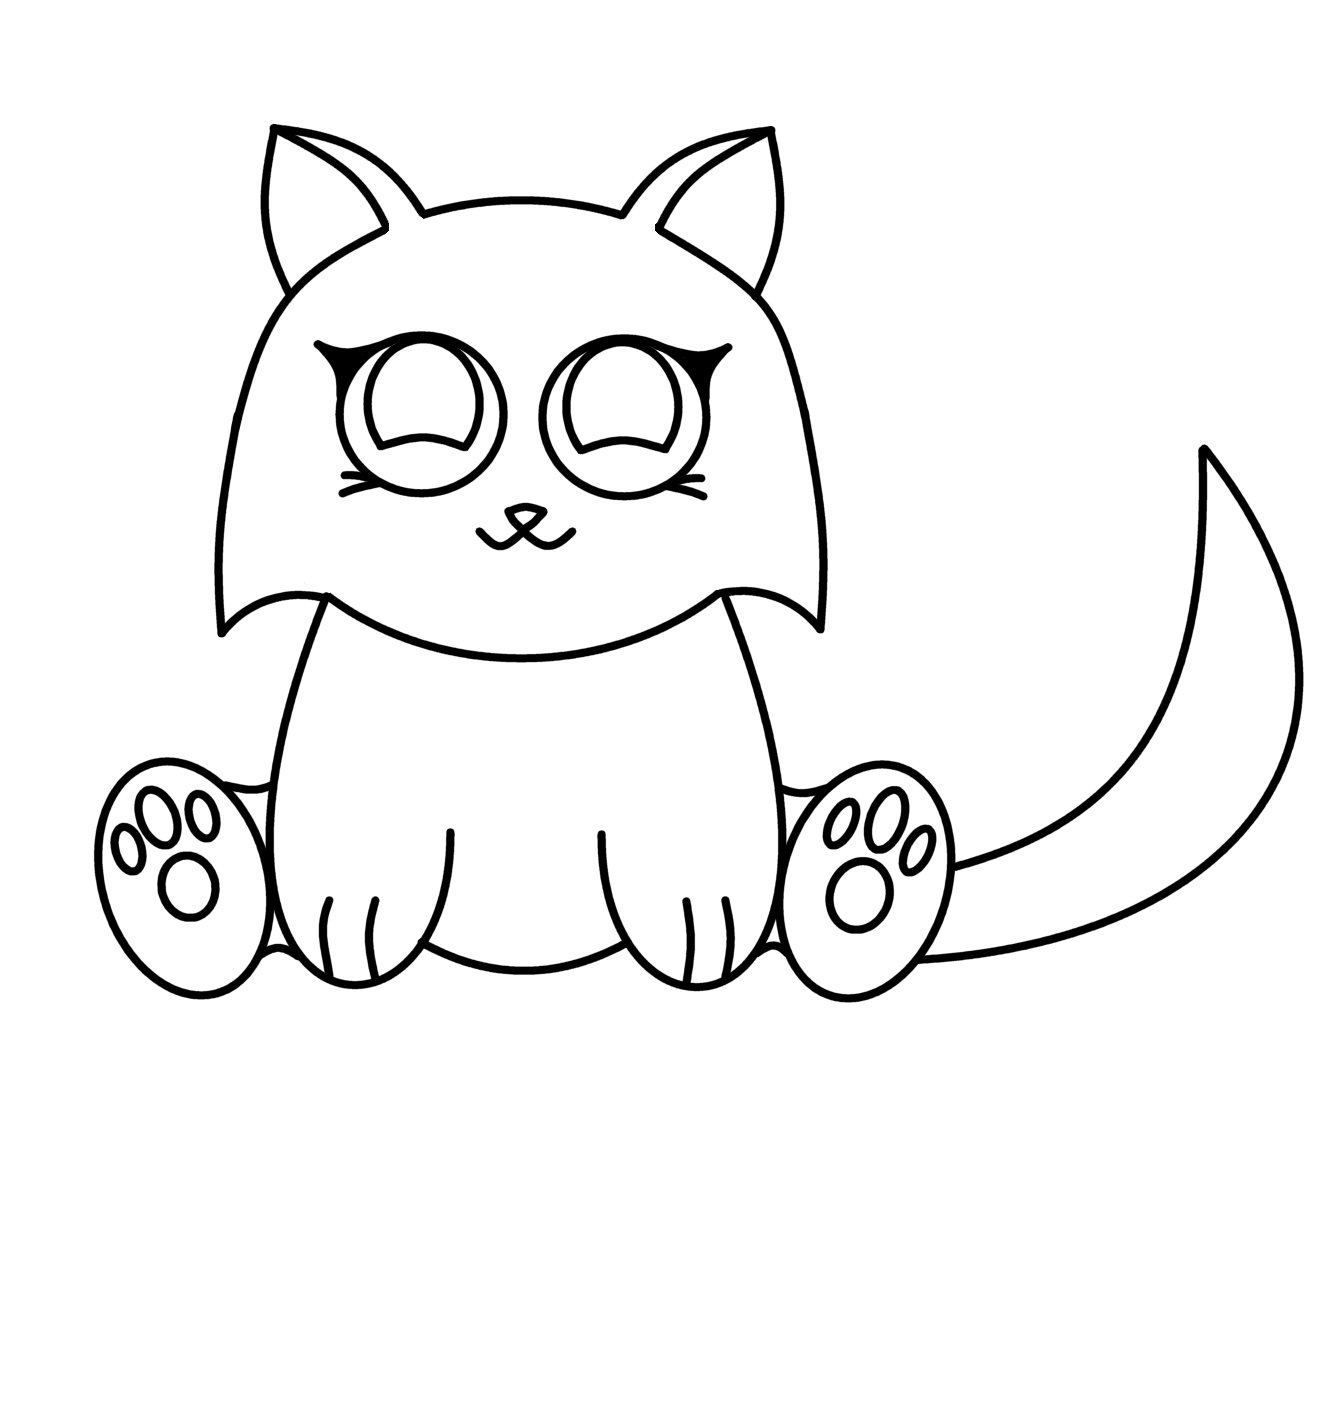 How To Draw Cartoons Anime Cat